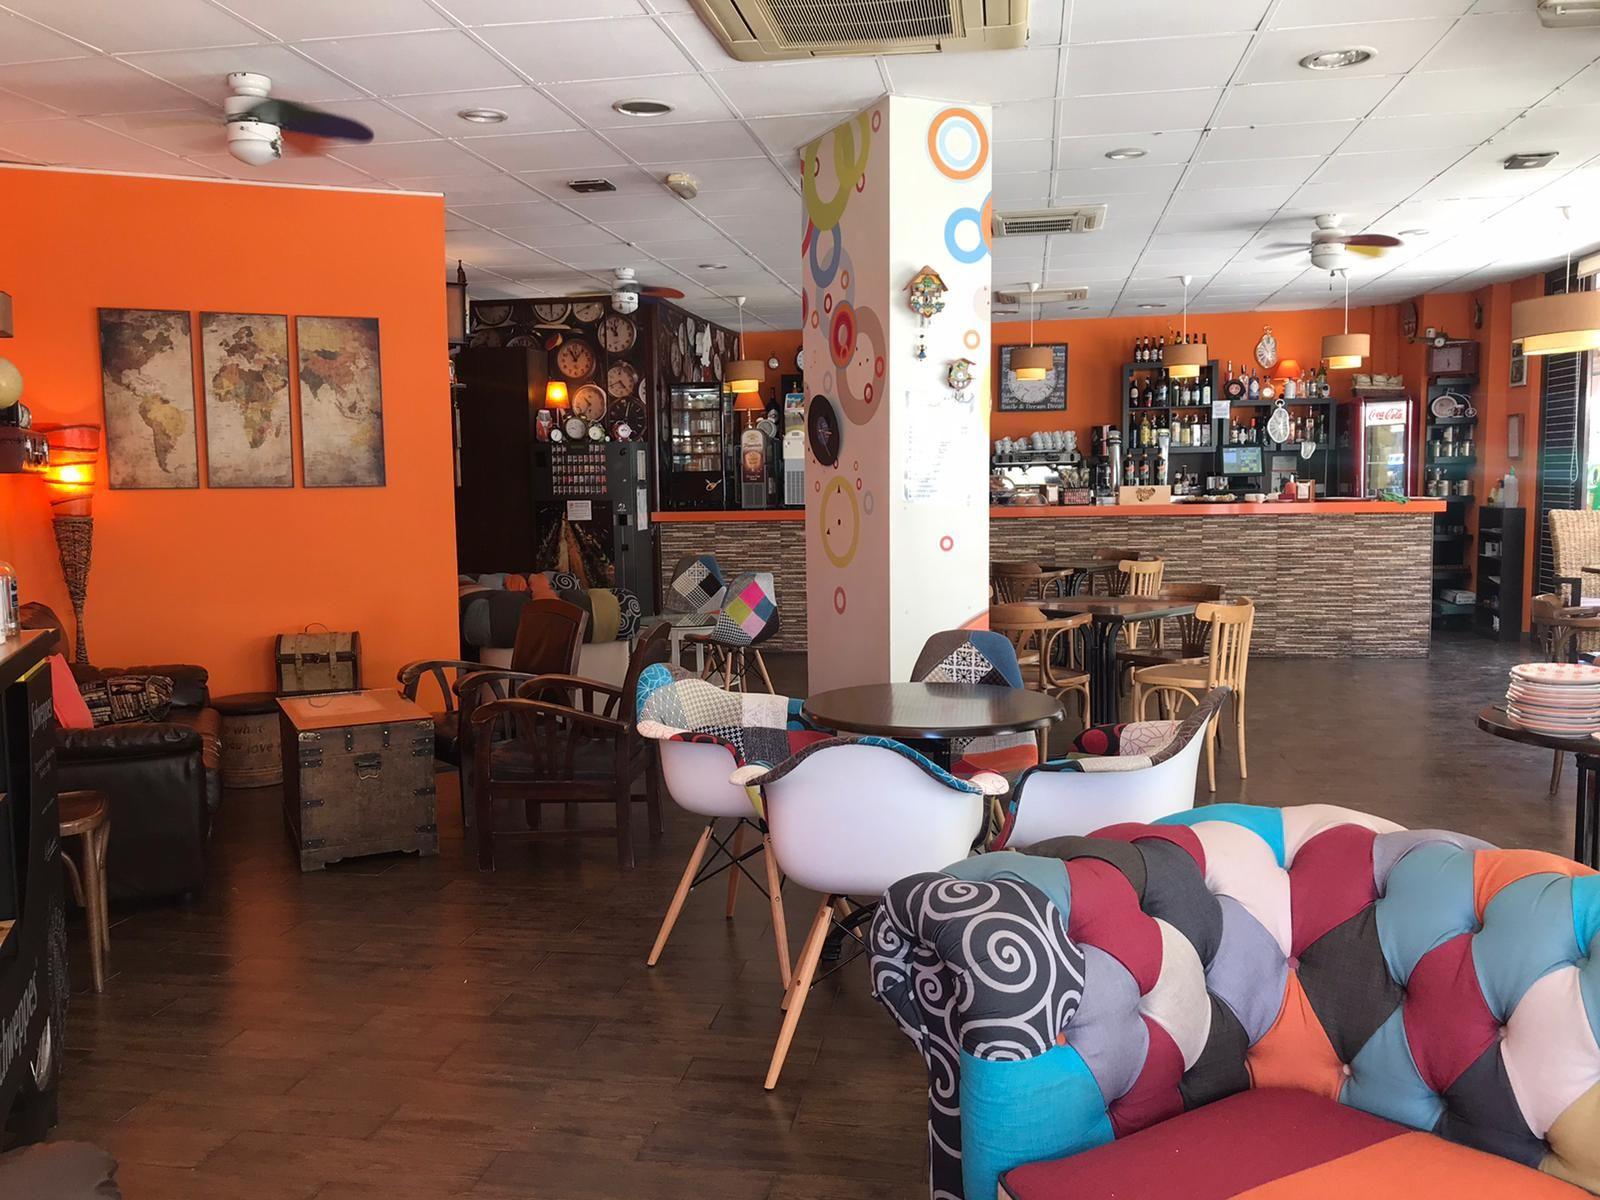 Foto 6 de Restaurante en Valencia | Cafetería Tosteria O´Clock